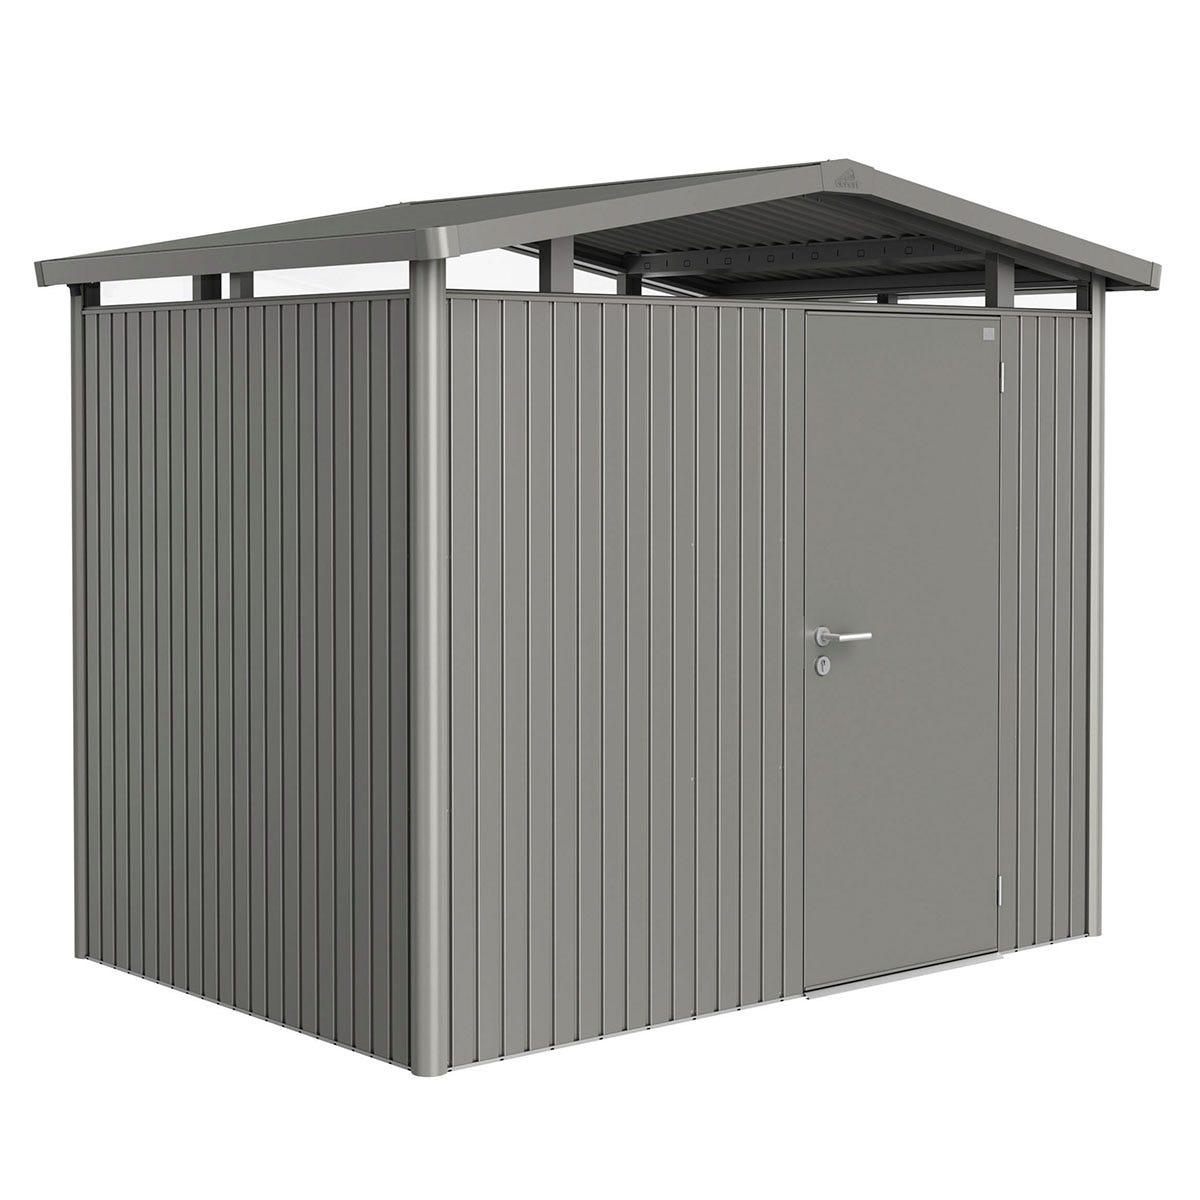 Biohort Panorama Metal Shed P2 Standard Door 9' x 6' 5'' - Quartz Grey